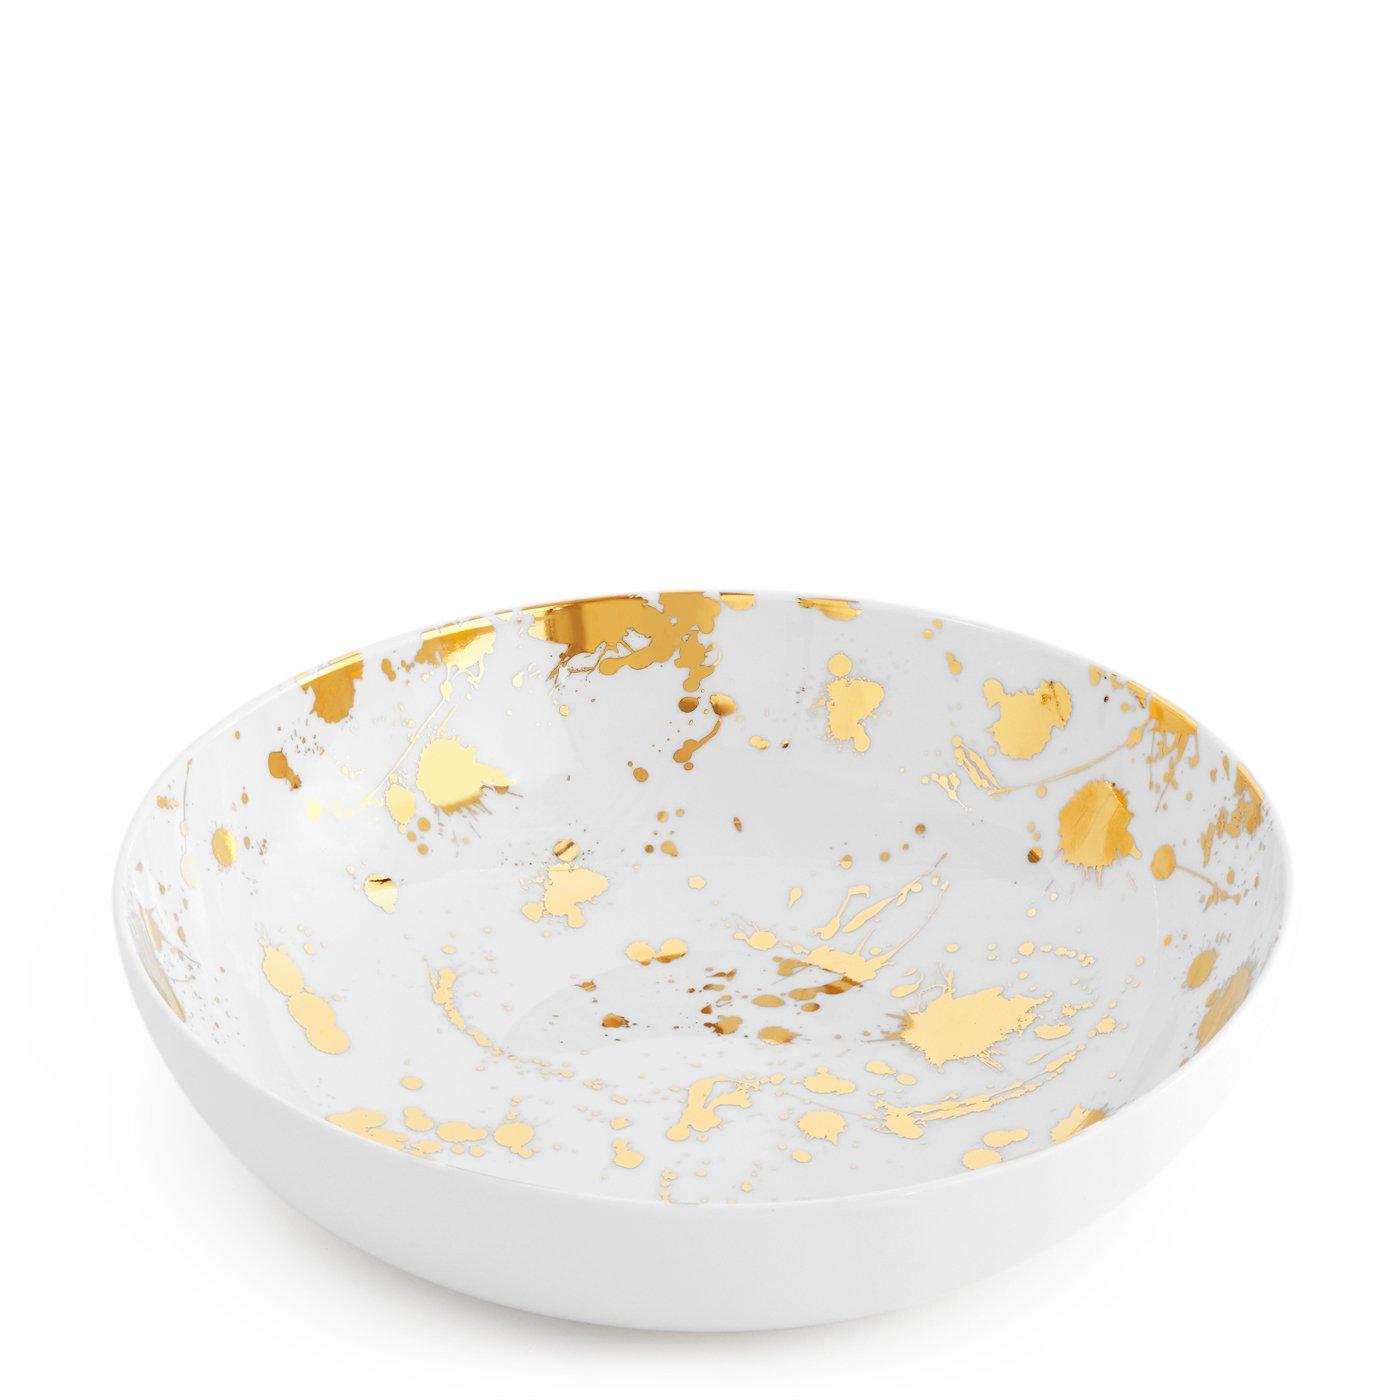 Jonathan Adler 21258 1948 Salad Bowl, Gold